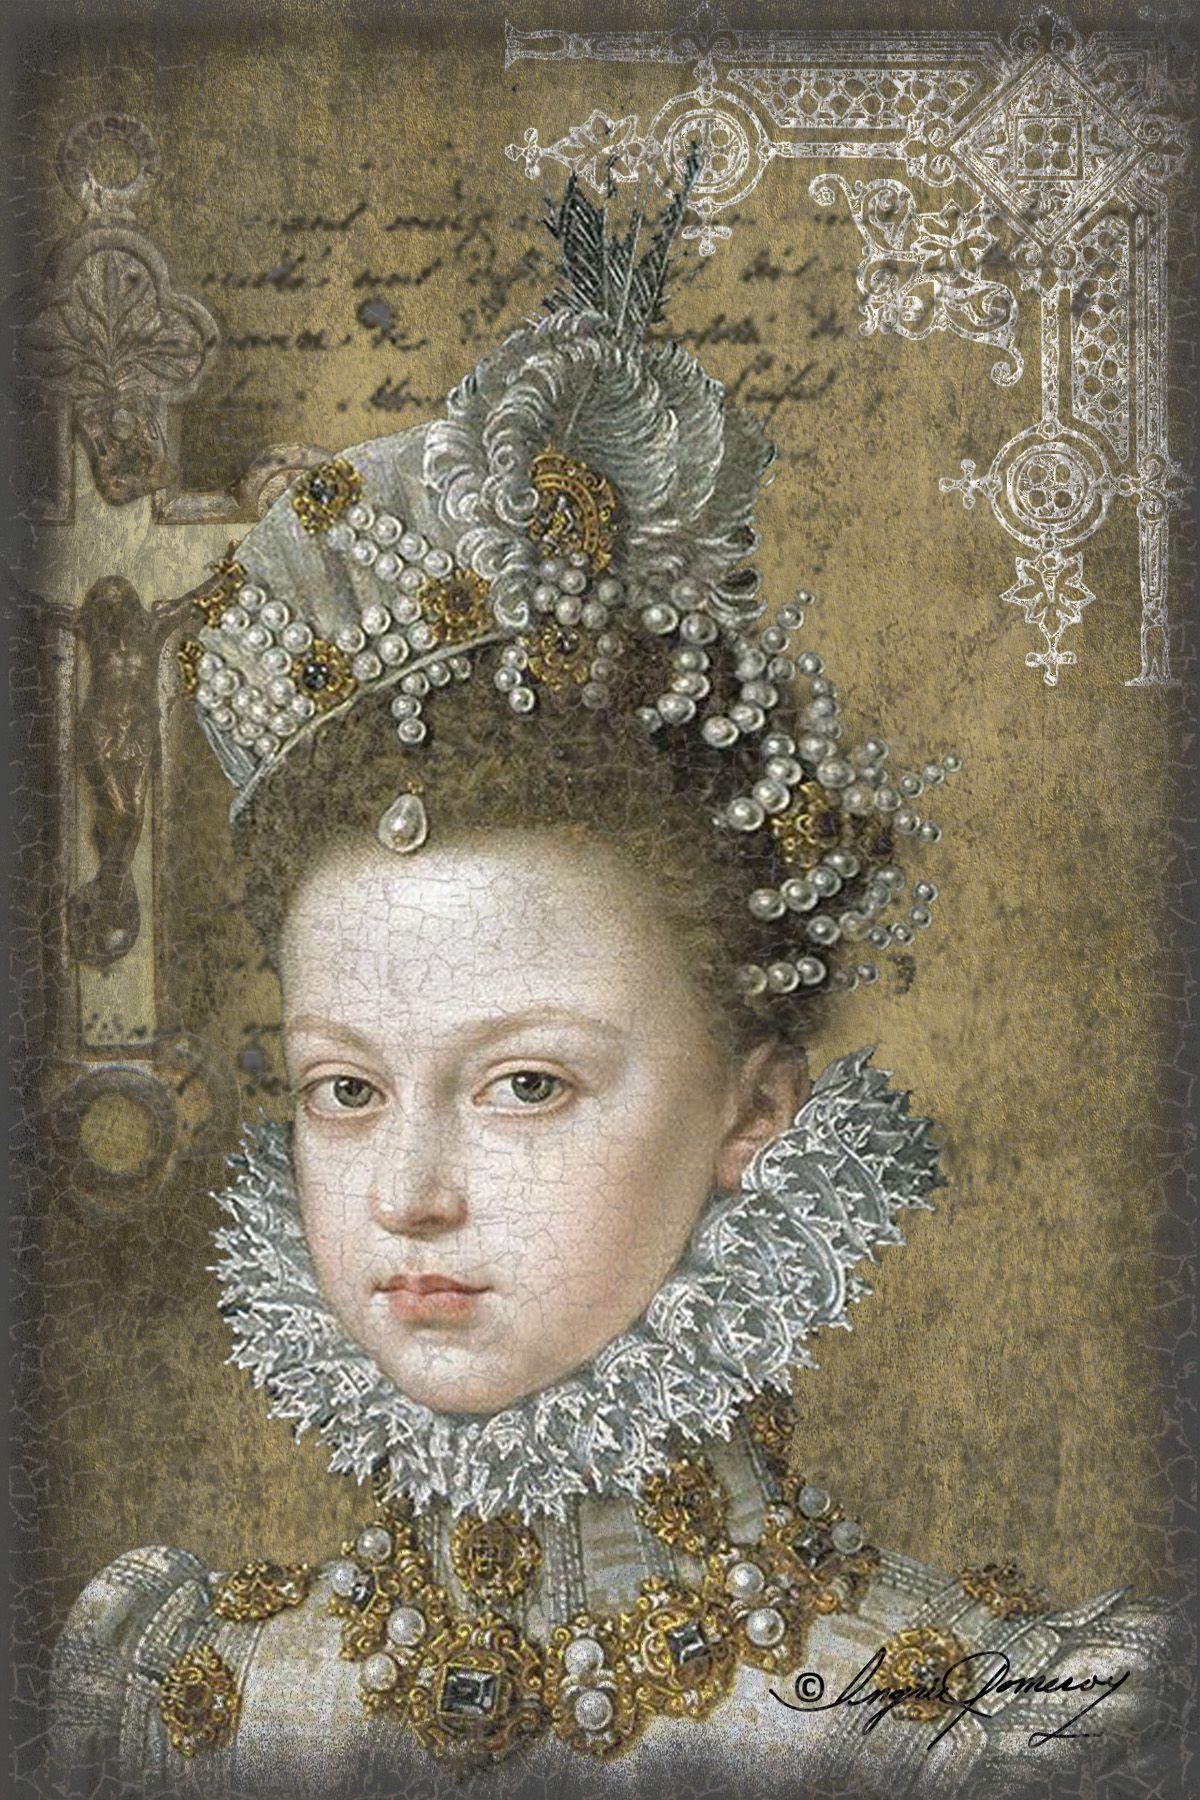 A Renaissance Queen Digital Collage. Art, Art images